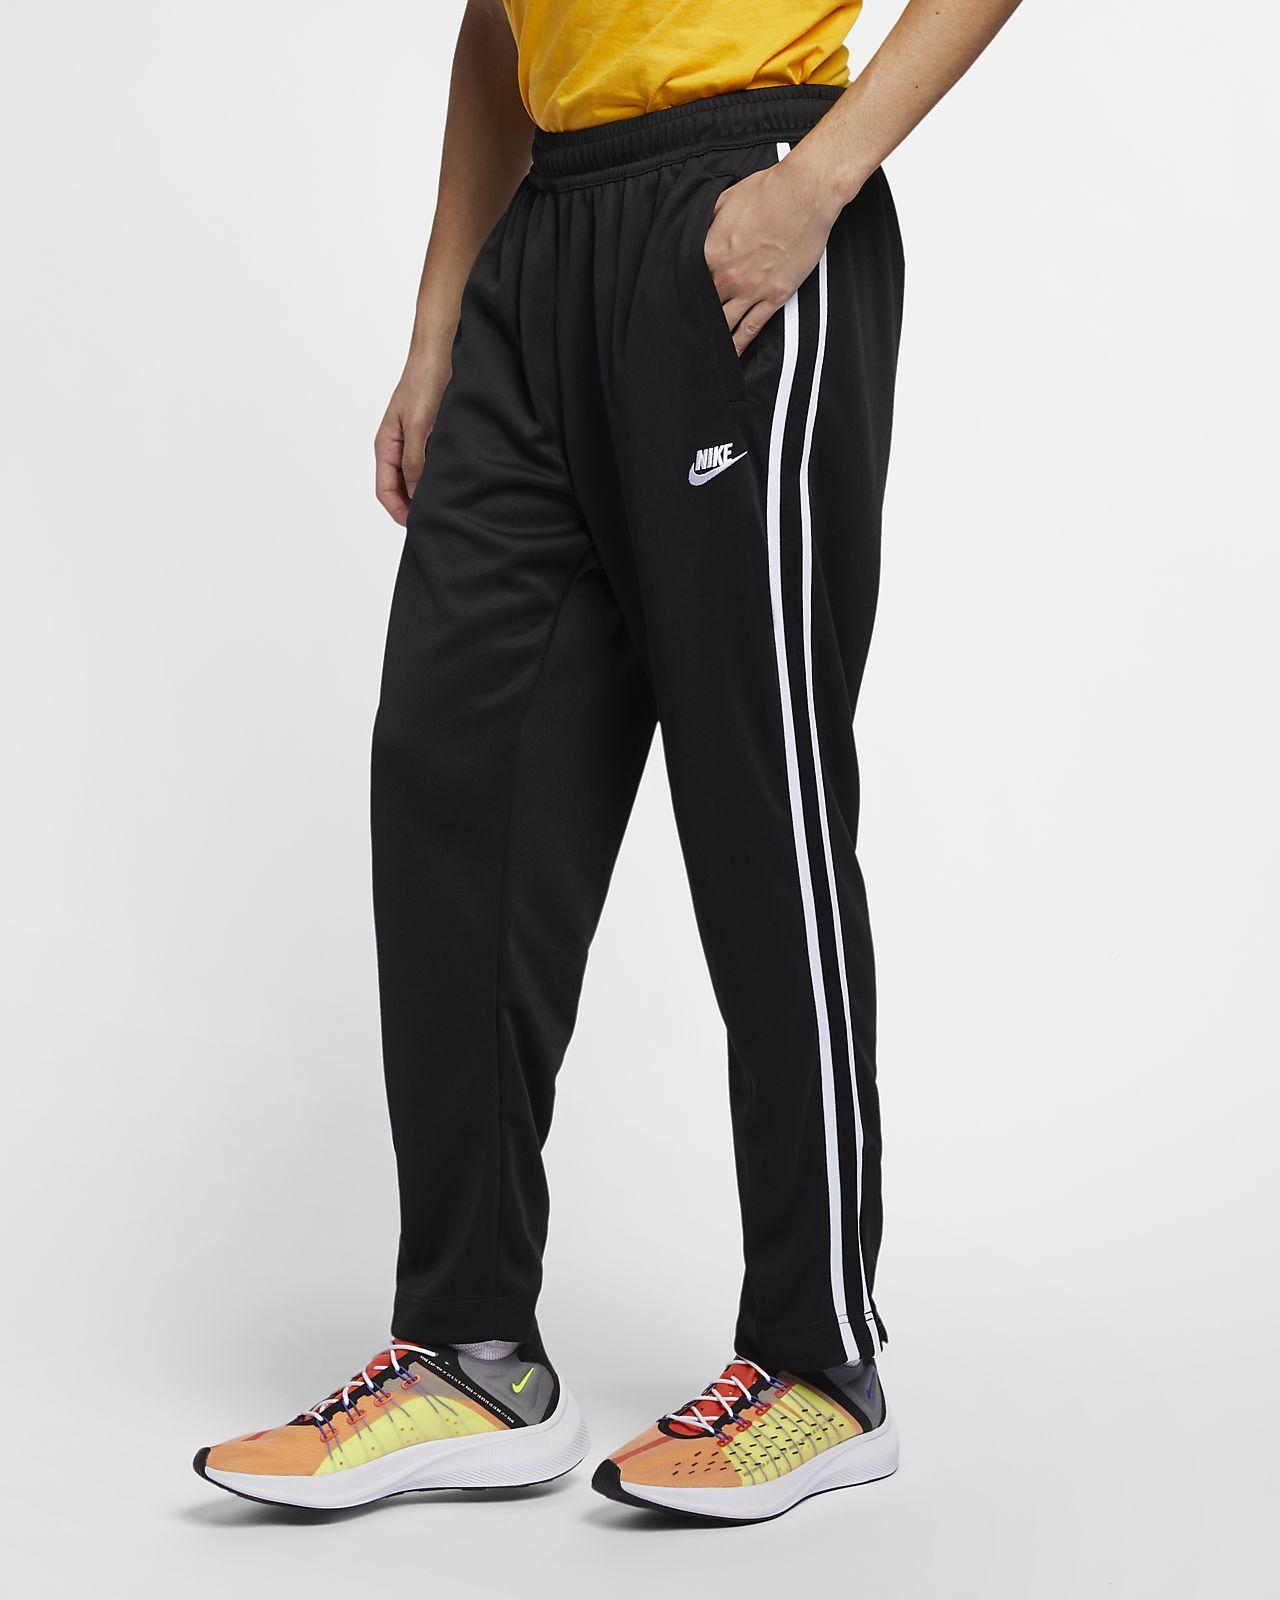 Nike Sportswear Sportswear Sportswear Sportswear Nike Nike HerenbroekNl Nike Sportswear HerenbroekNl HerenbroekNl Nike HerenbroekNl VpUGSqzM